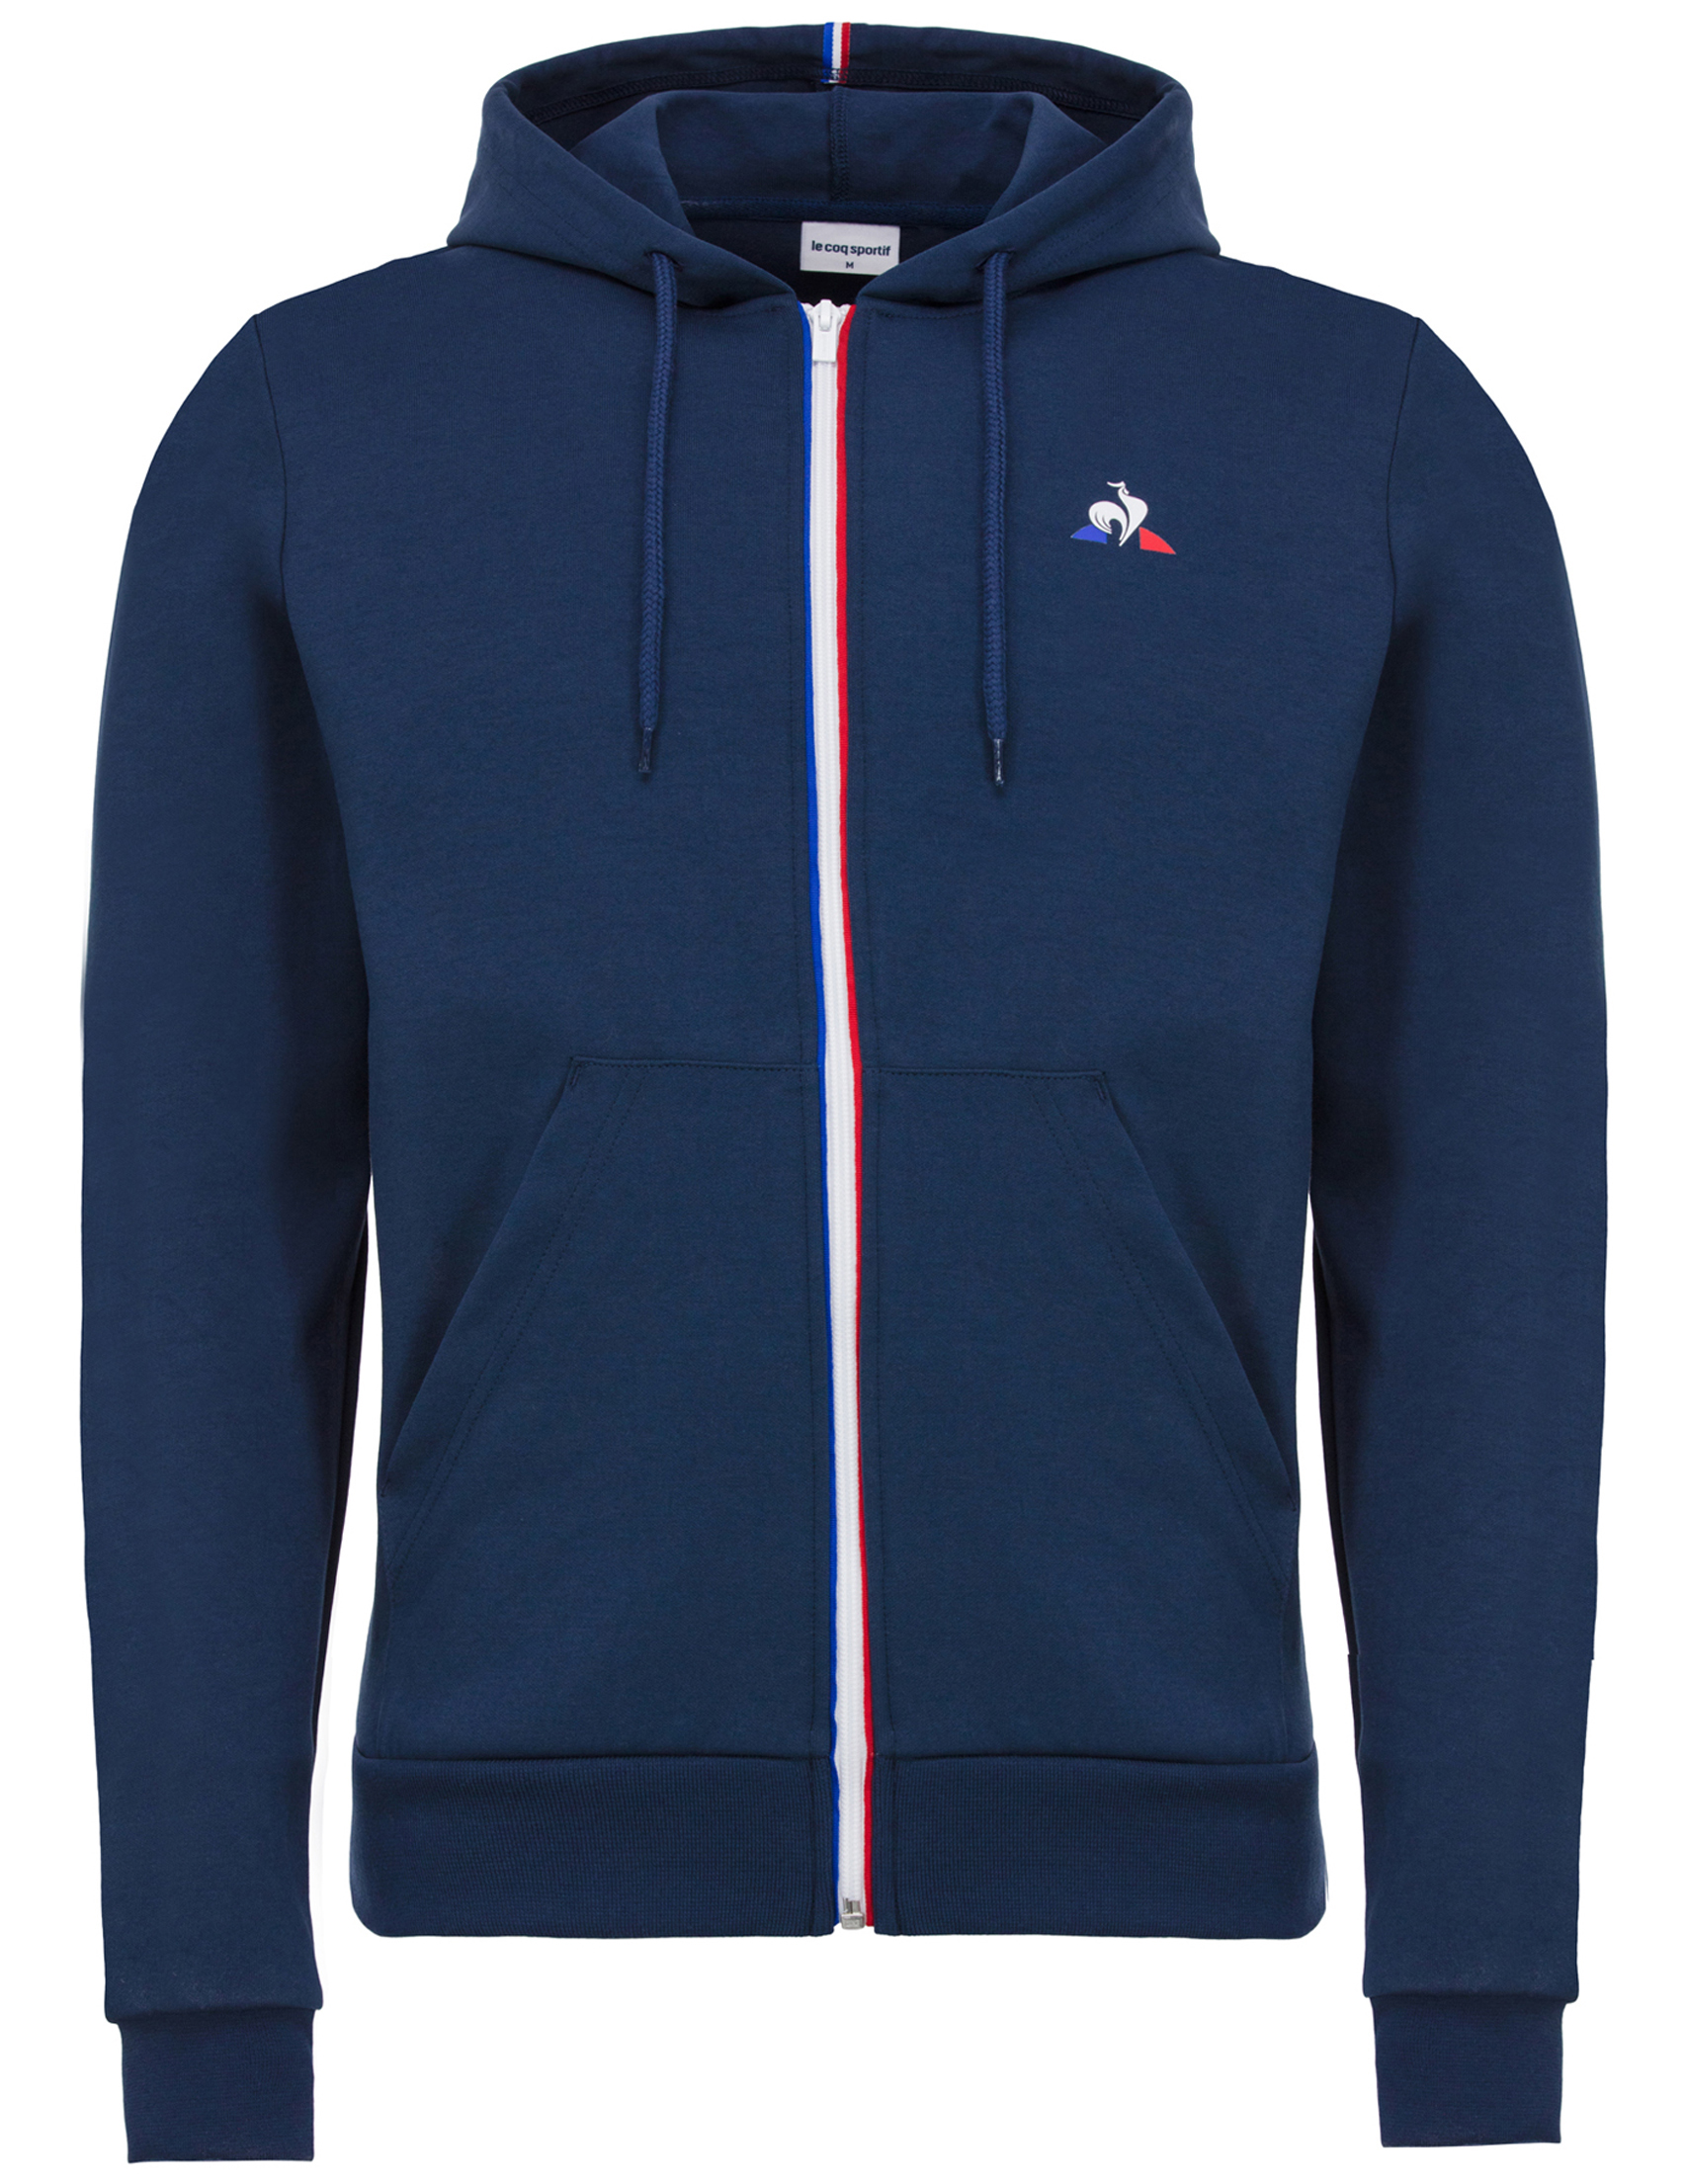 Купить Спортивная кофта, LE COQ SPORTIF, Синий, 85%Хлопок 15%Полиэстер, Осень-Зима